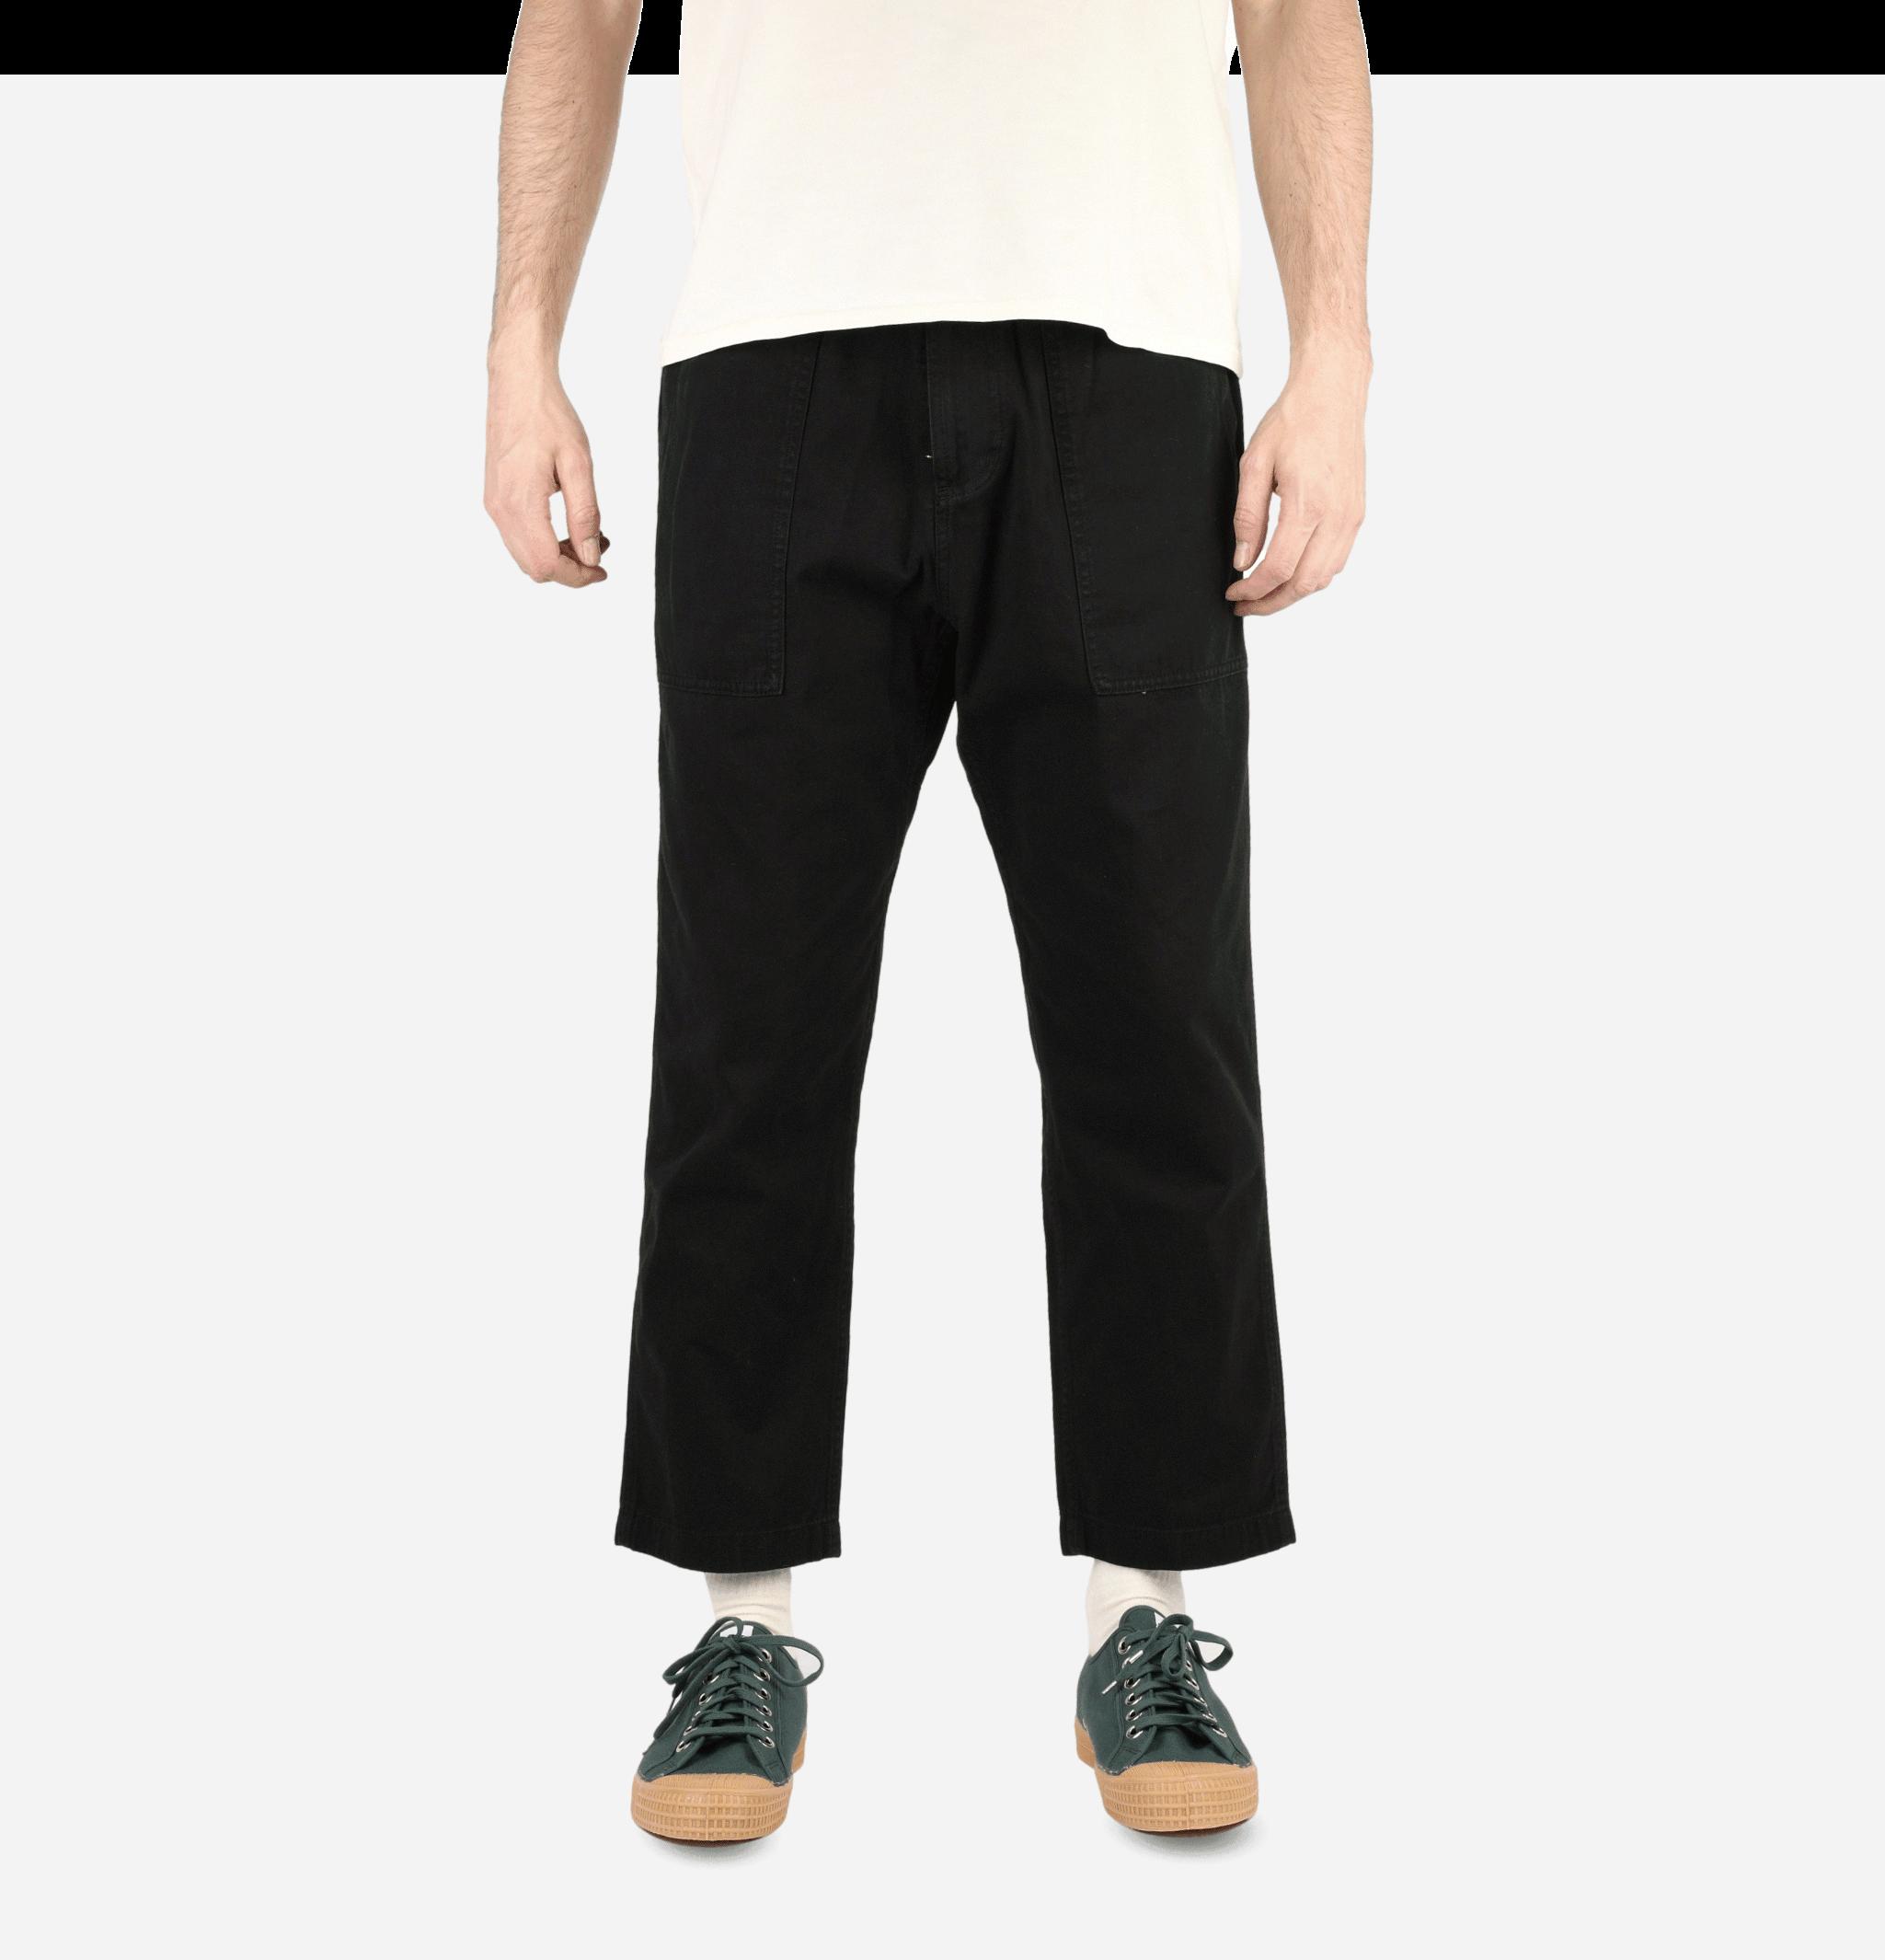 Loose Tapered Pants Black